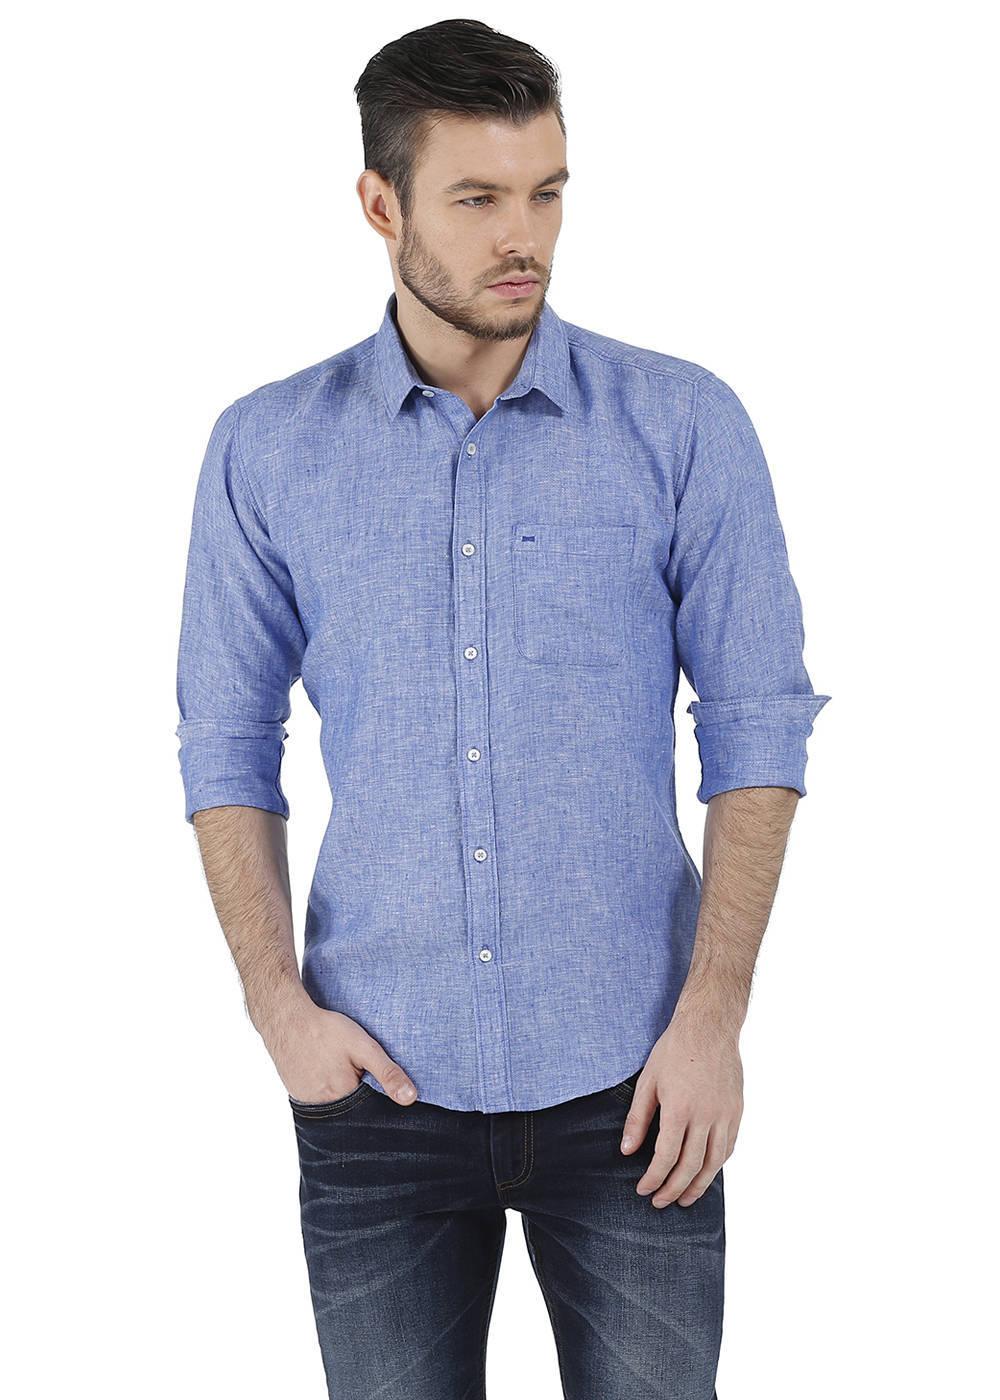 Basics   Basics Slim Fit Blue Chambray Linen Shirt-16BCSH34296